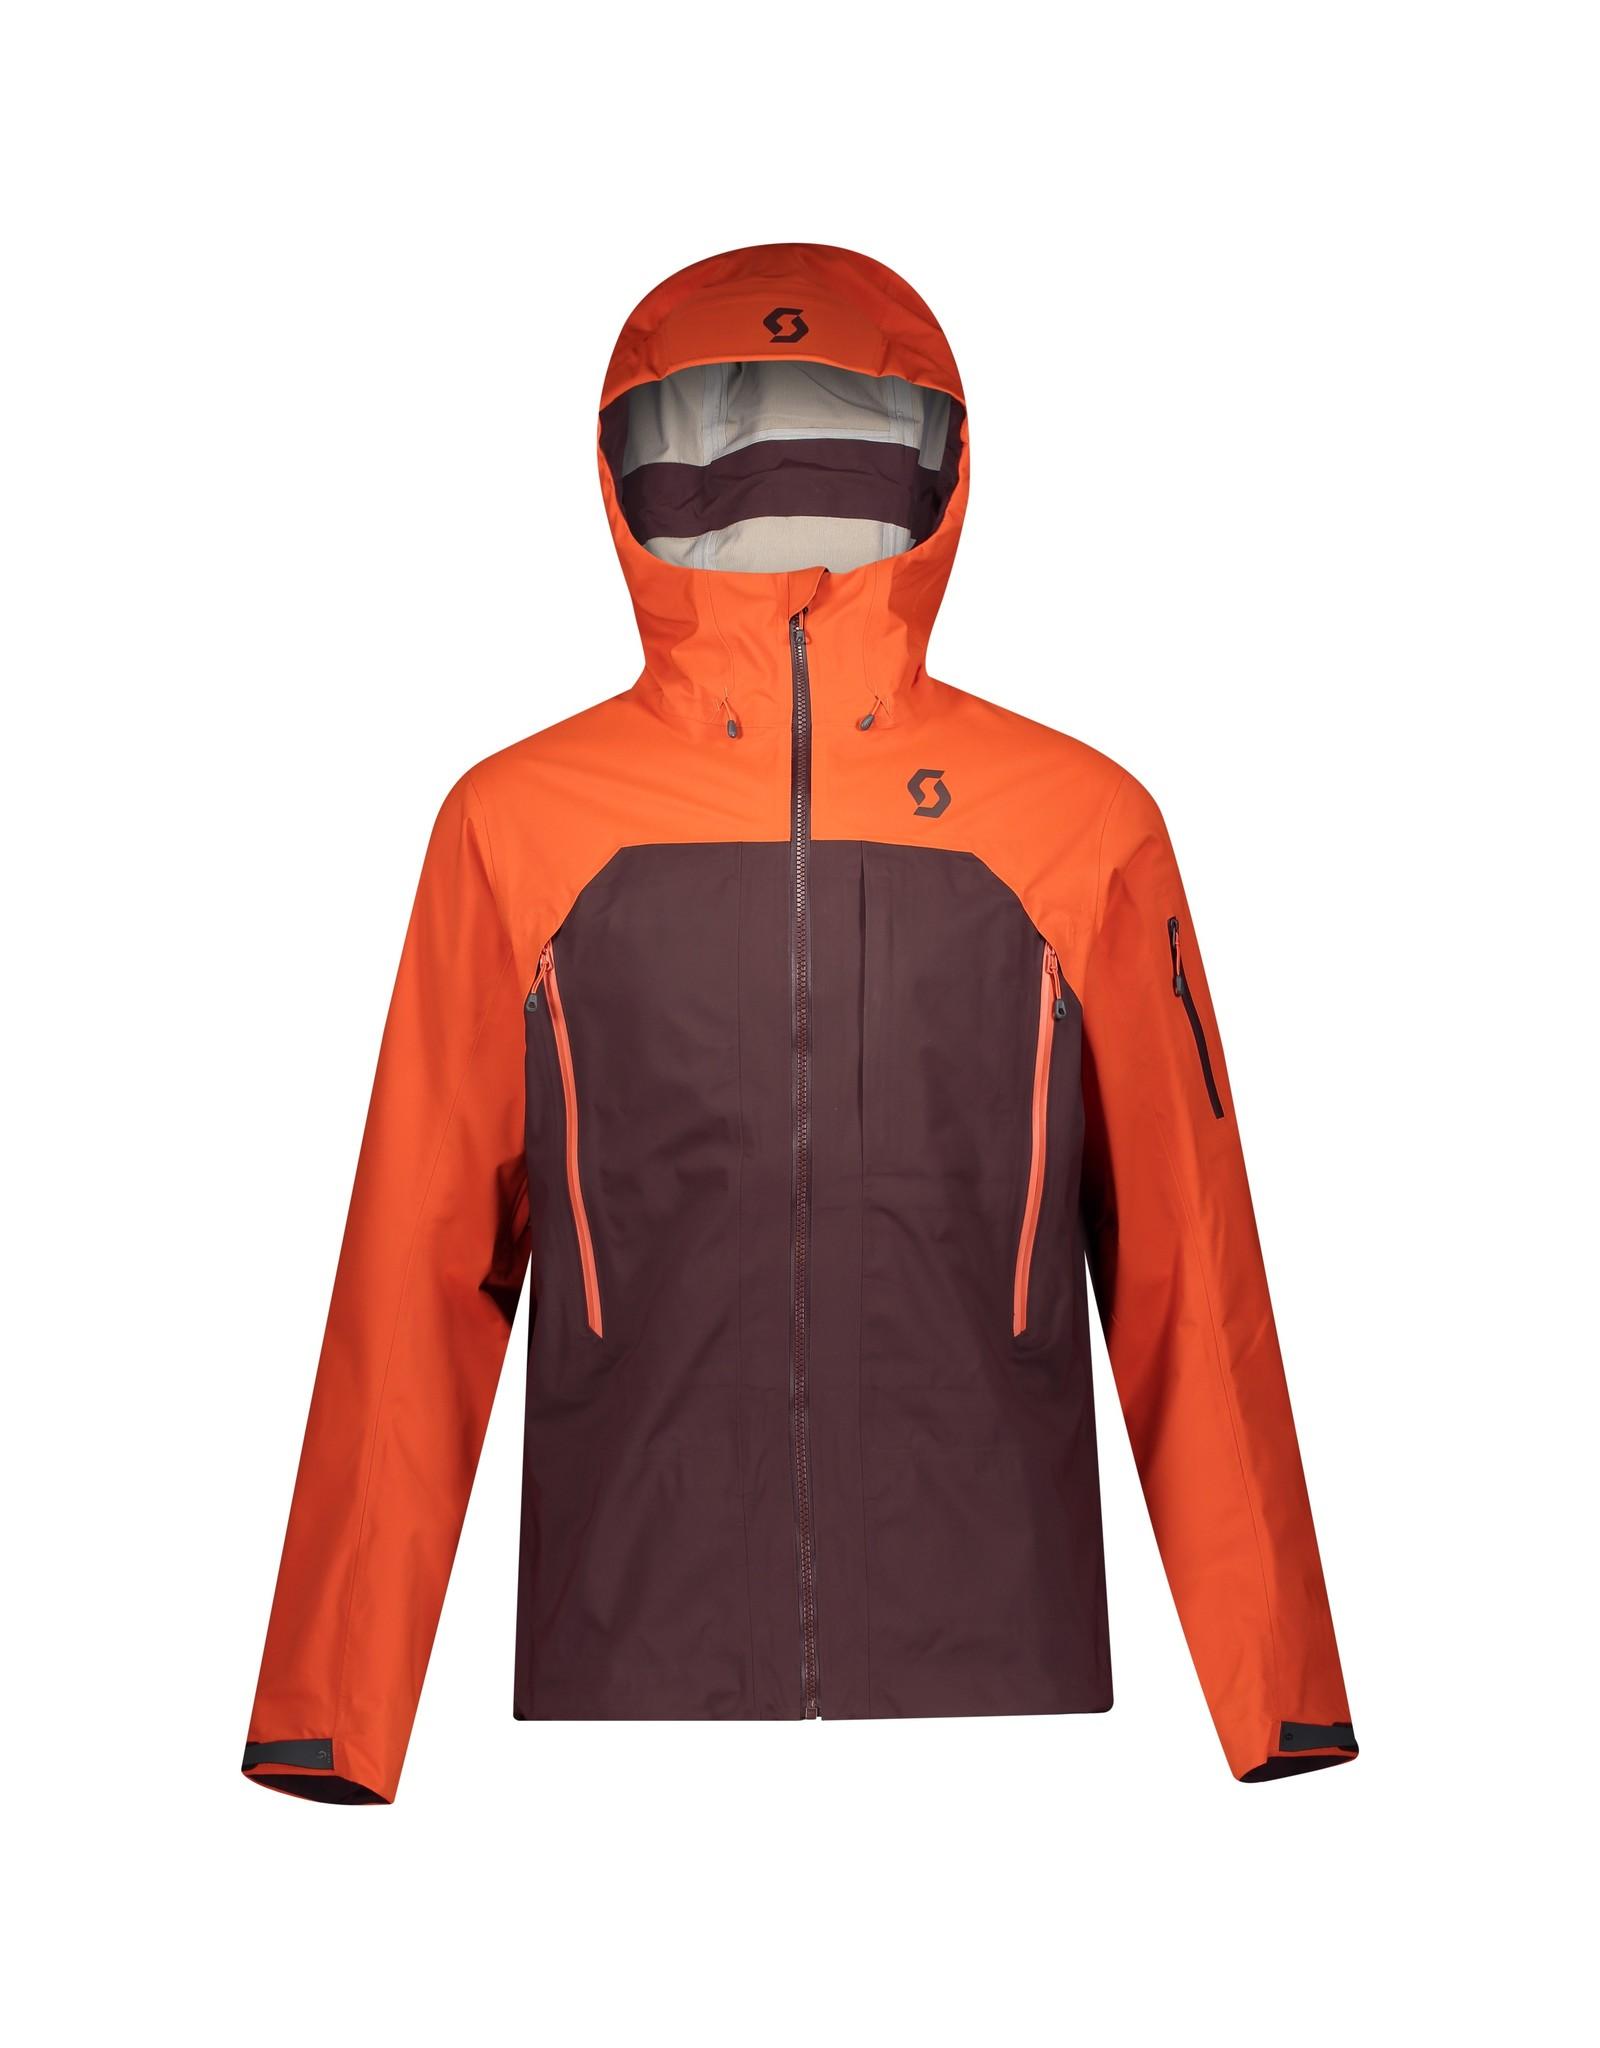 Scott Explorair 3L Jacket 2021/22